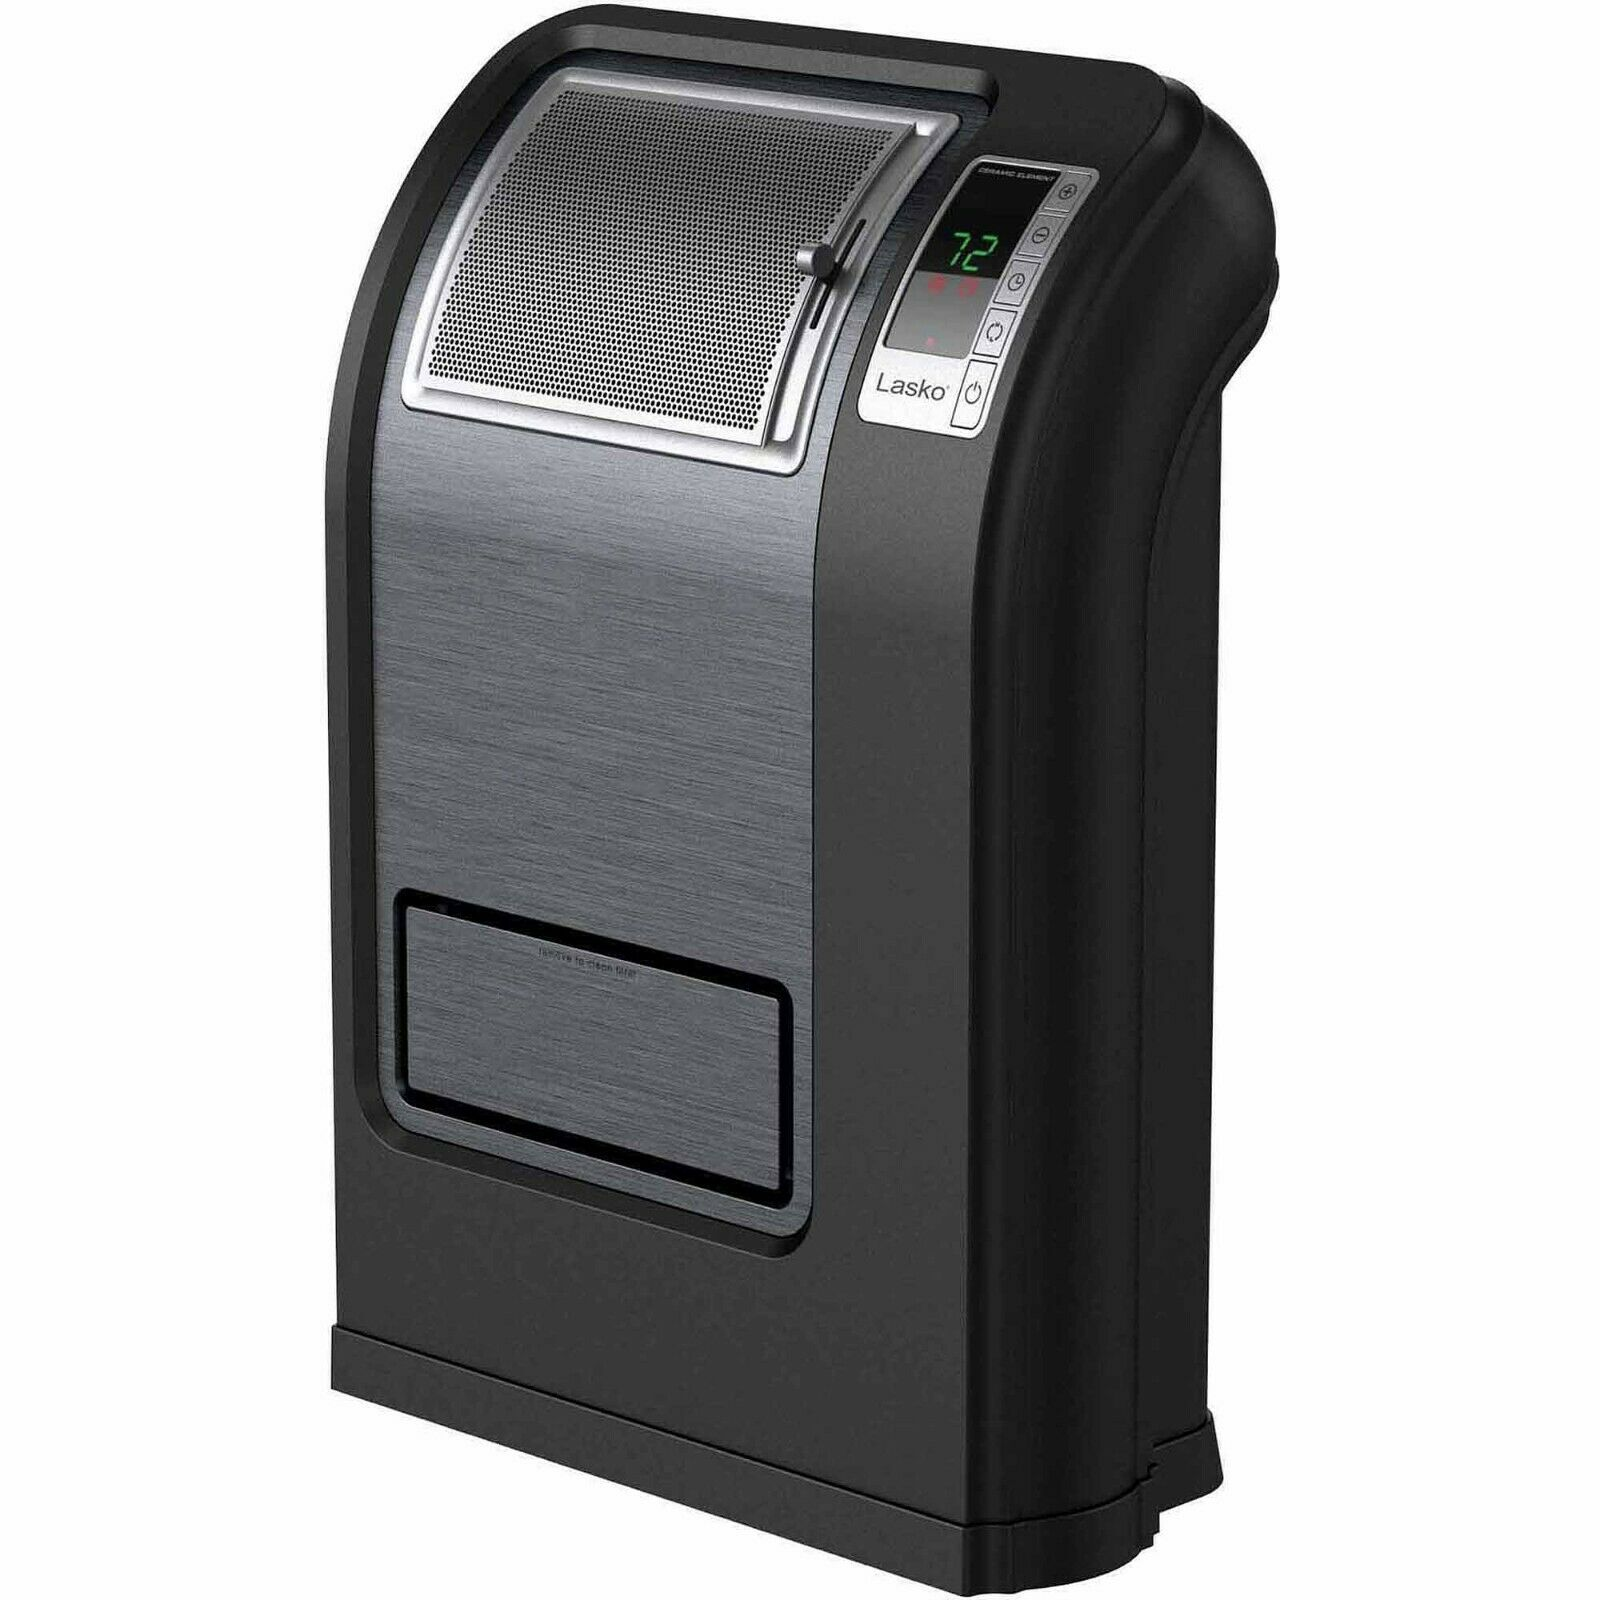 Lasko Cyclonic Digital Ceramic Heater